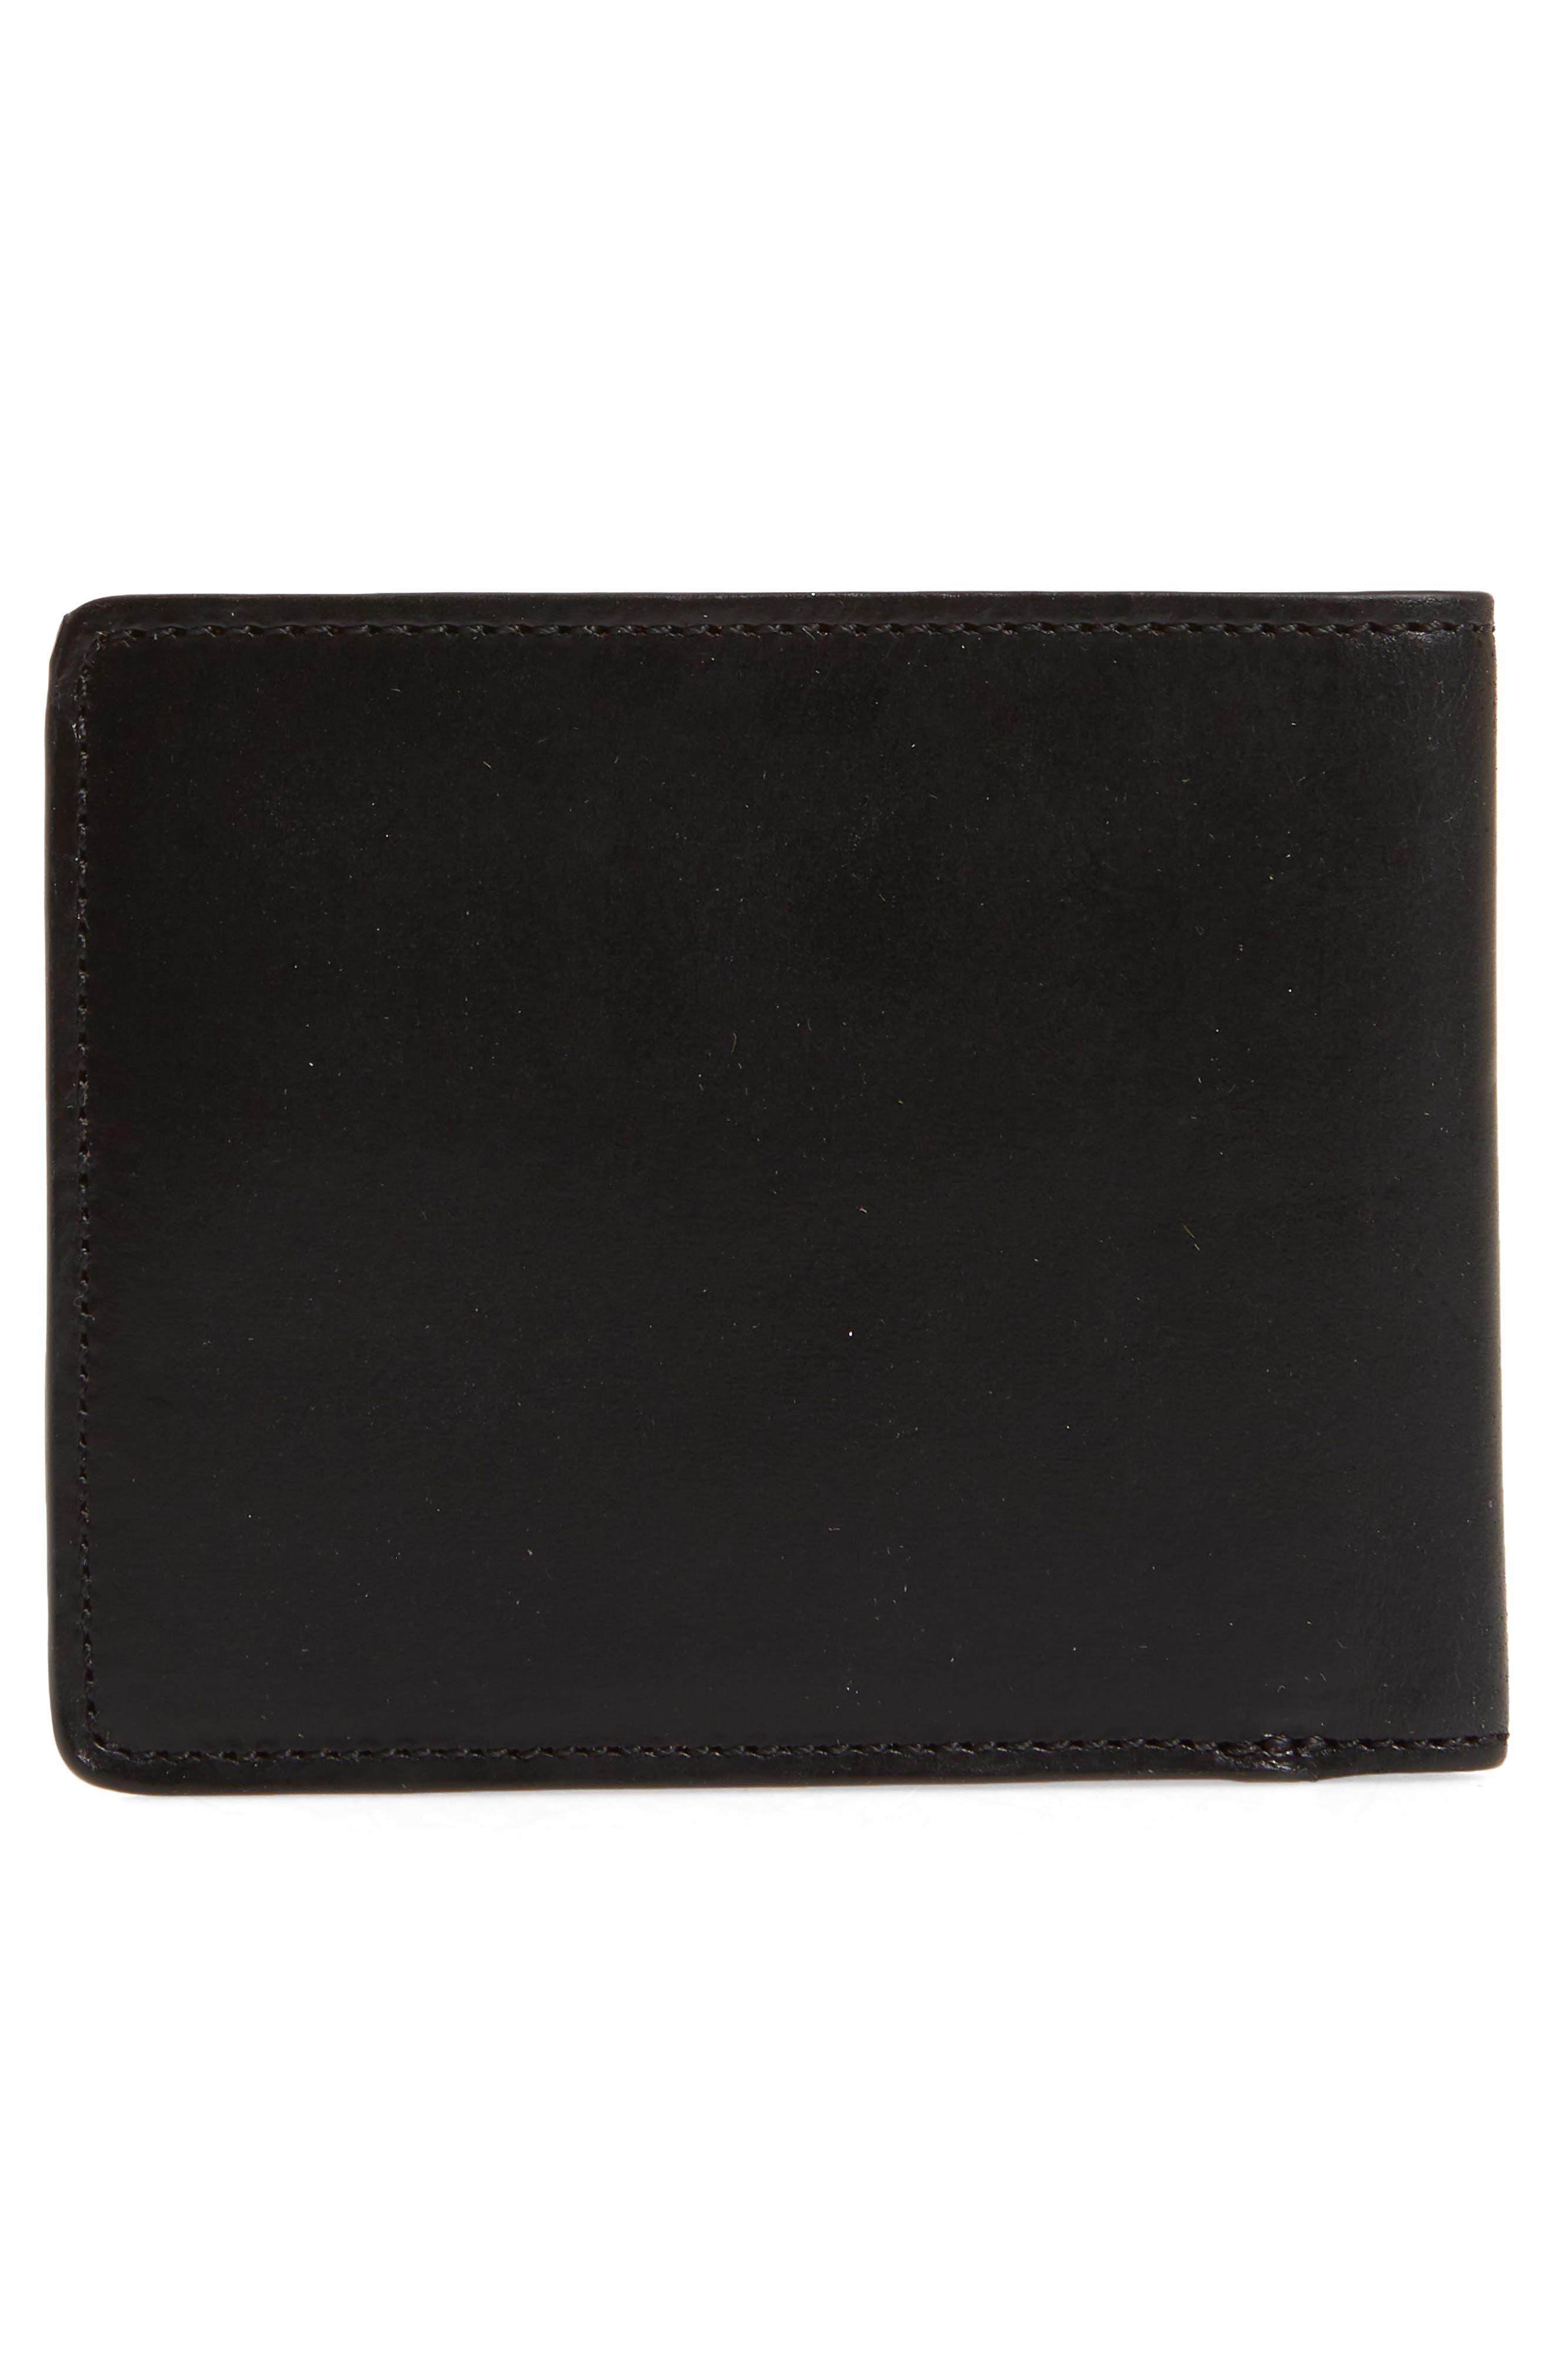 Darien Leather Wallet,                             Alternate thumbnail 3, color,                             001